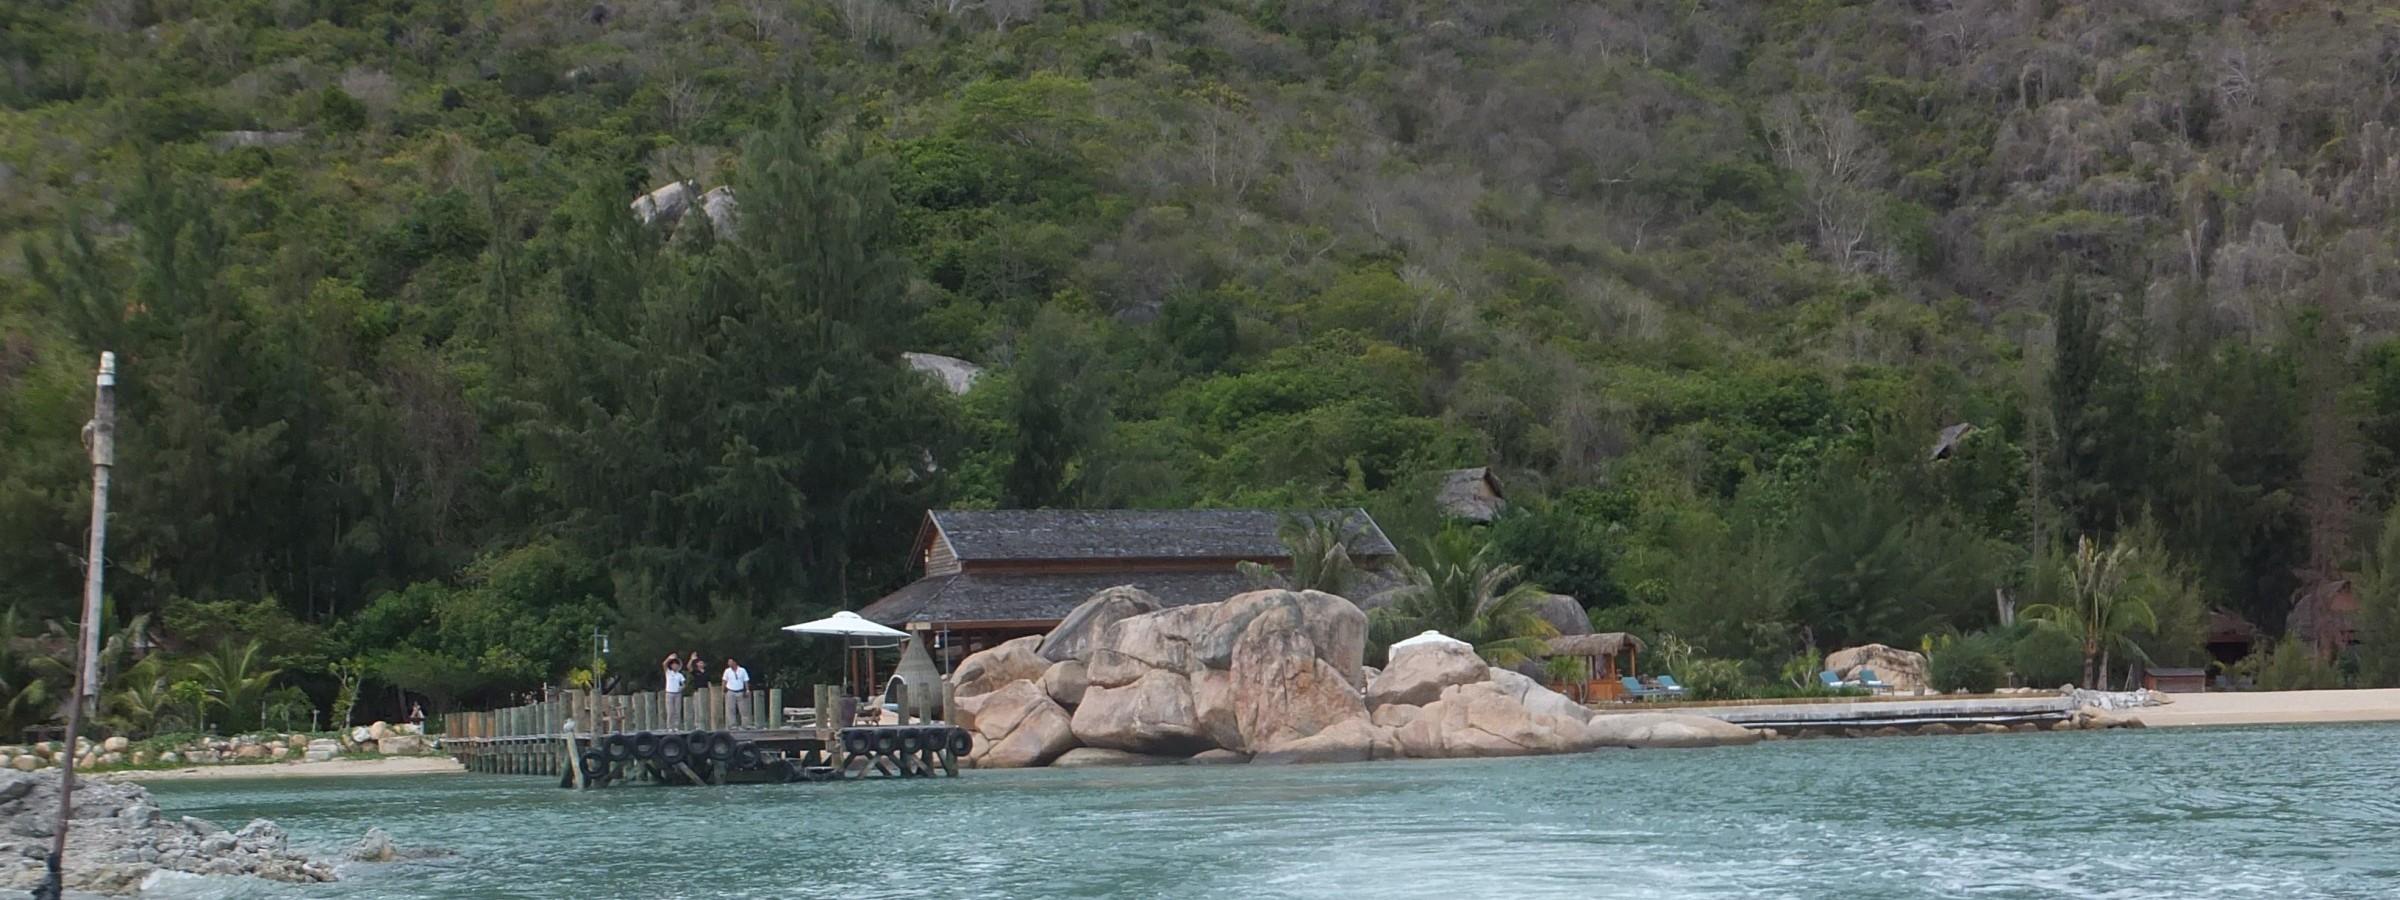 Hotel Review – An Lam Resort, Ninh Van Bay, Vietnam